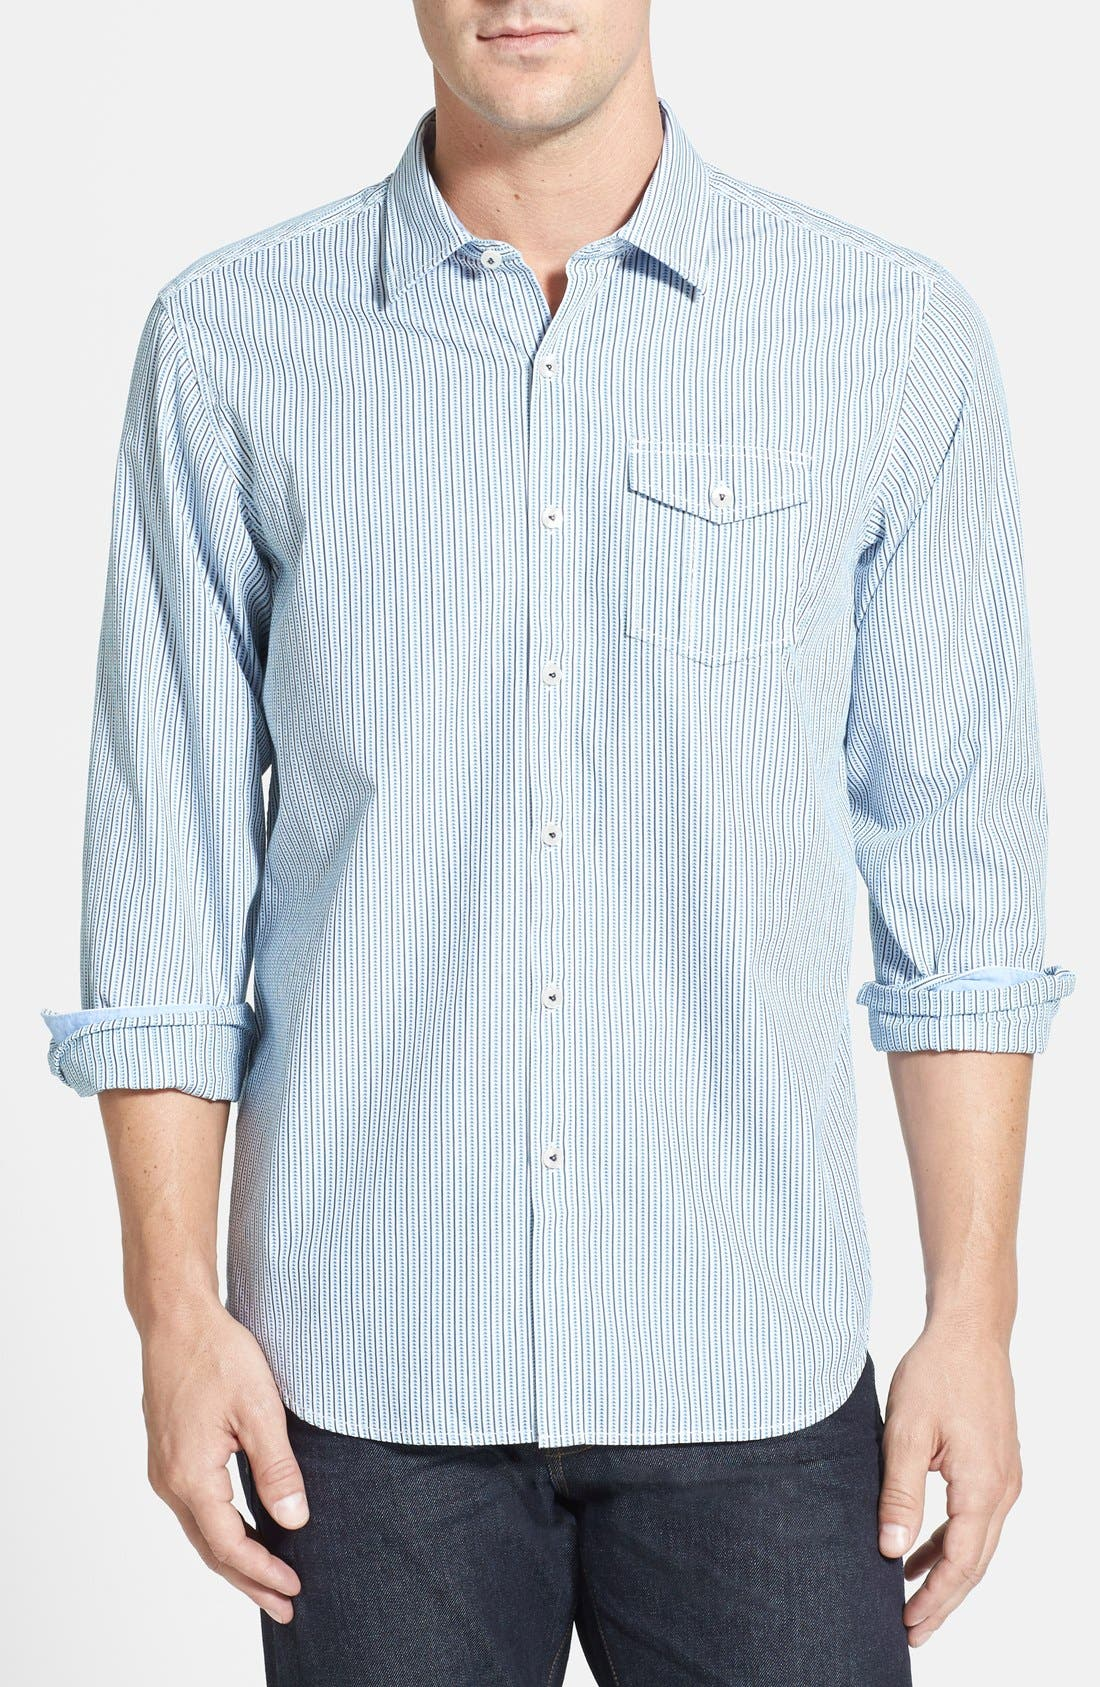 Main Image - Tommy Bahama Denim 'Tres Stripe' Island Modern Fit Sport Shirt